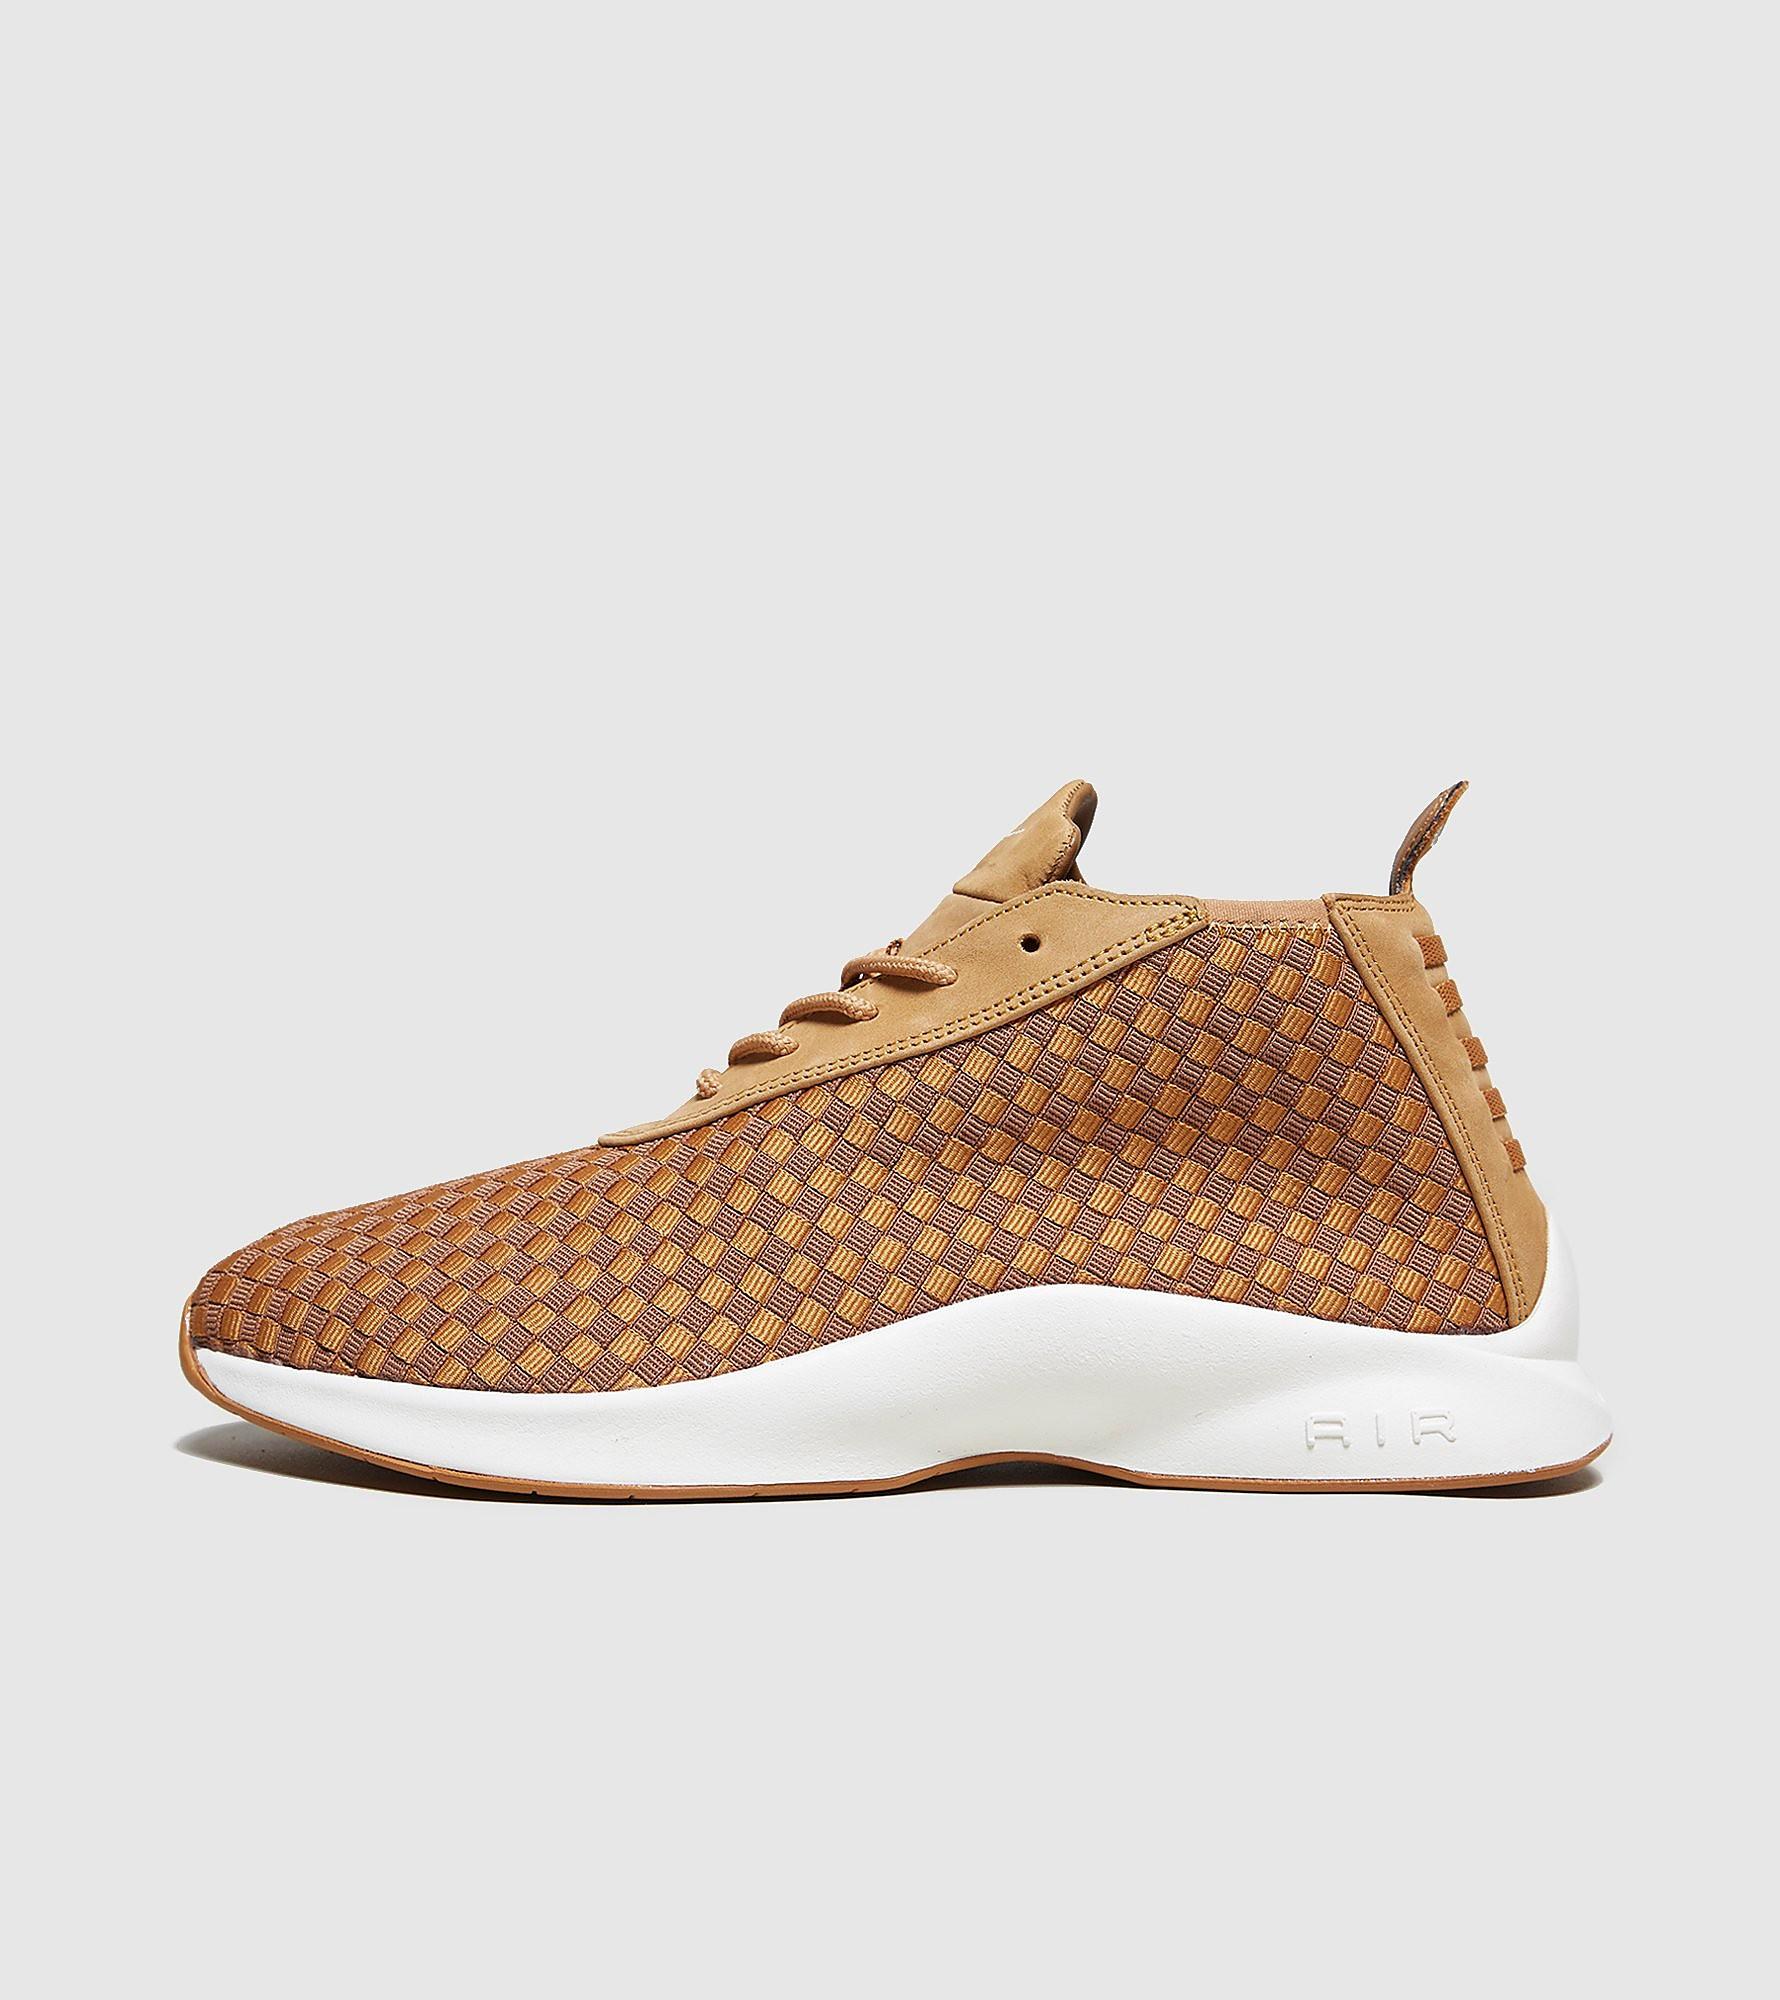 Nike Air Woven Boot Flax, Brown